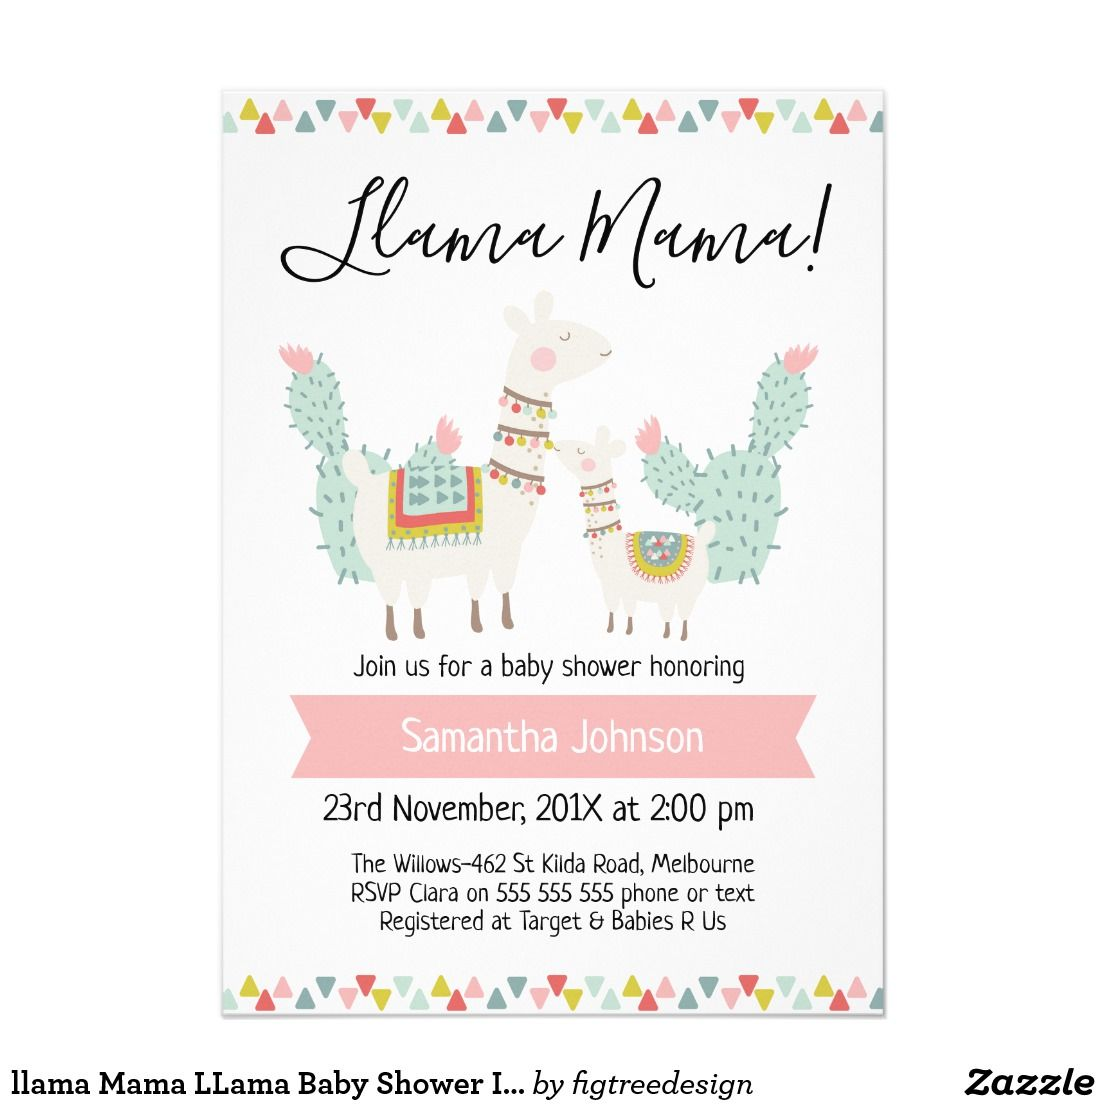 Llama Mama Llama Baby Shower Invitation Zazzle Com In 2019 Llama